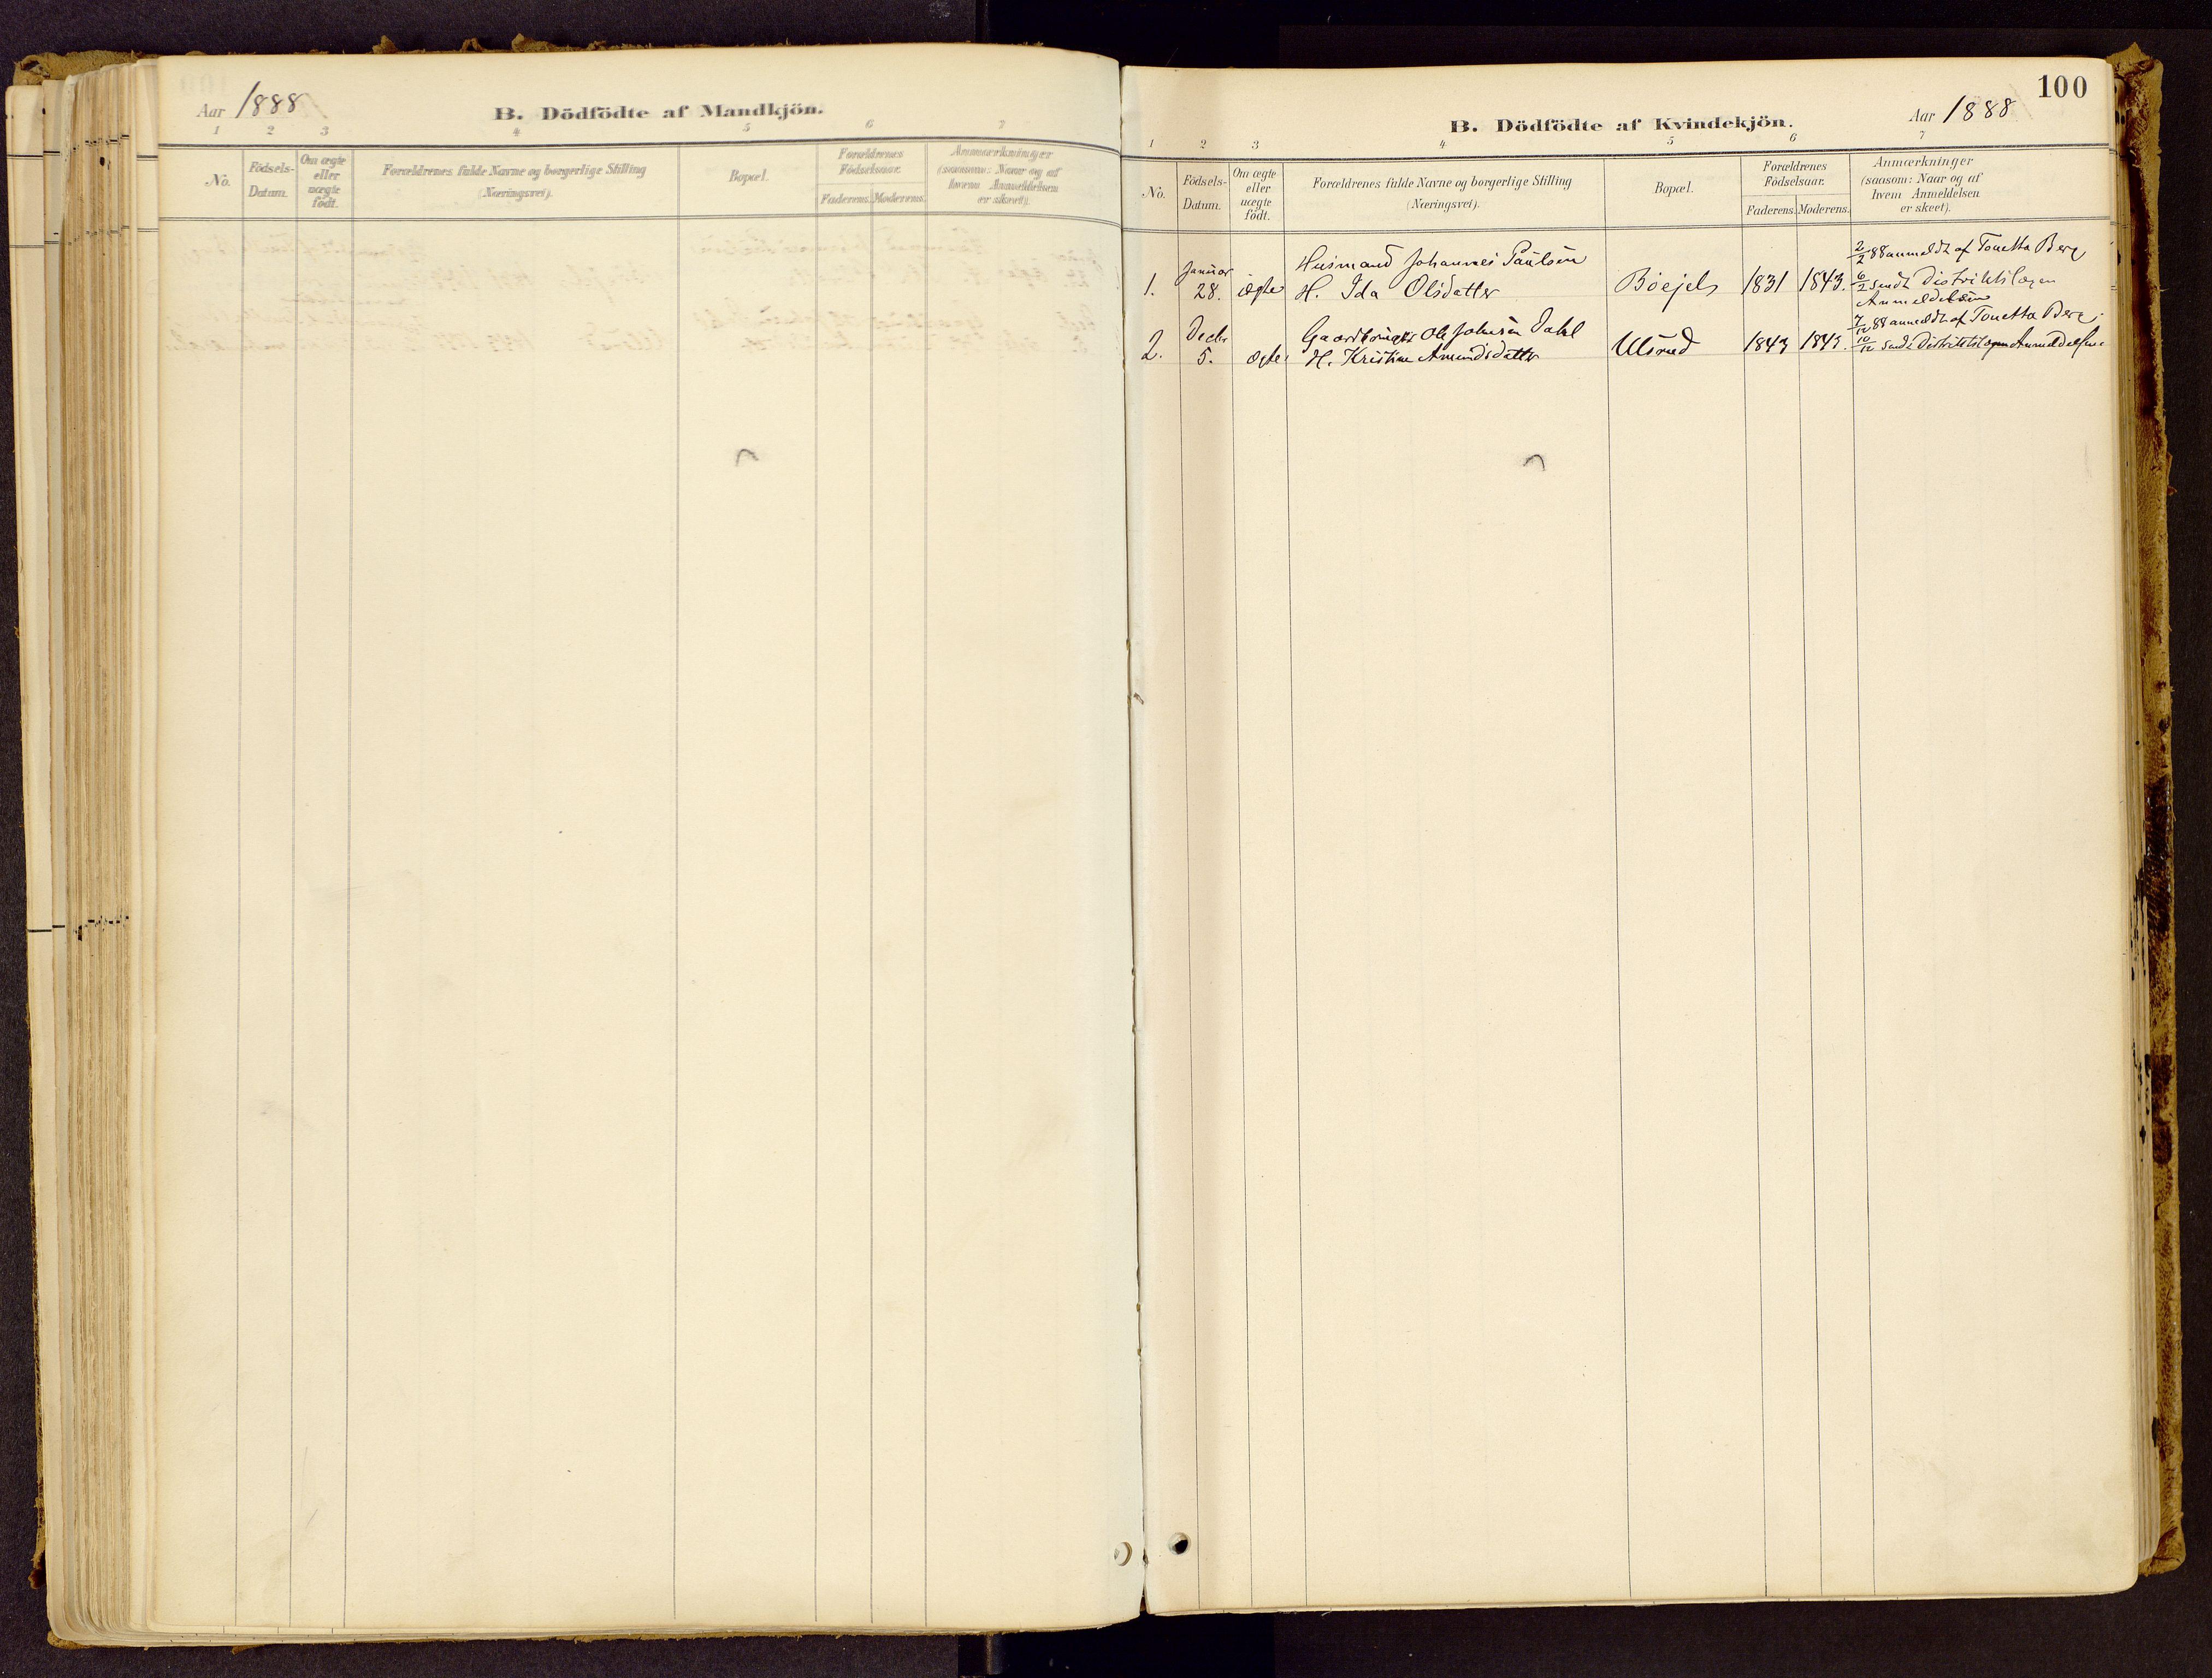 SAH, Vestre Gausdal prestekontor, Ministerialbok nr. 1, 1887-1914, s. 100